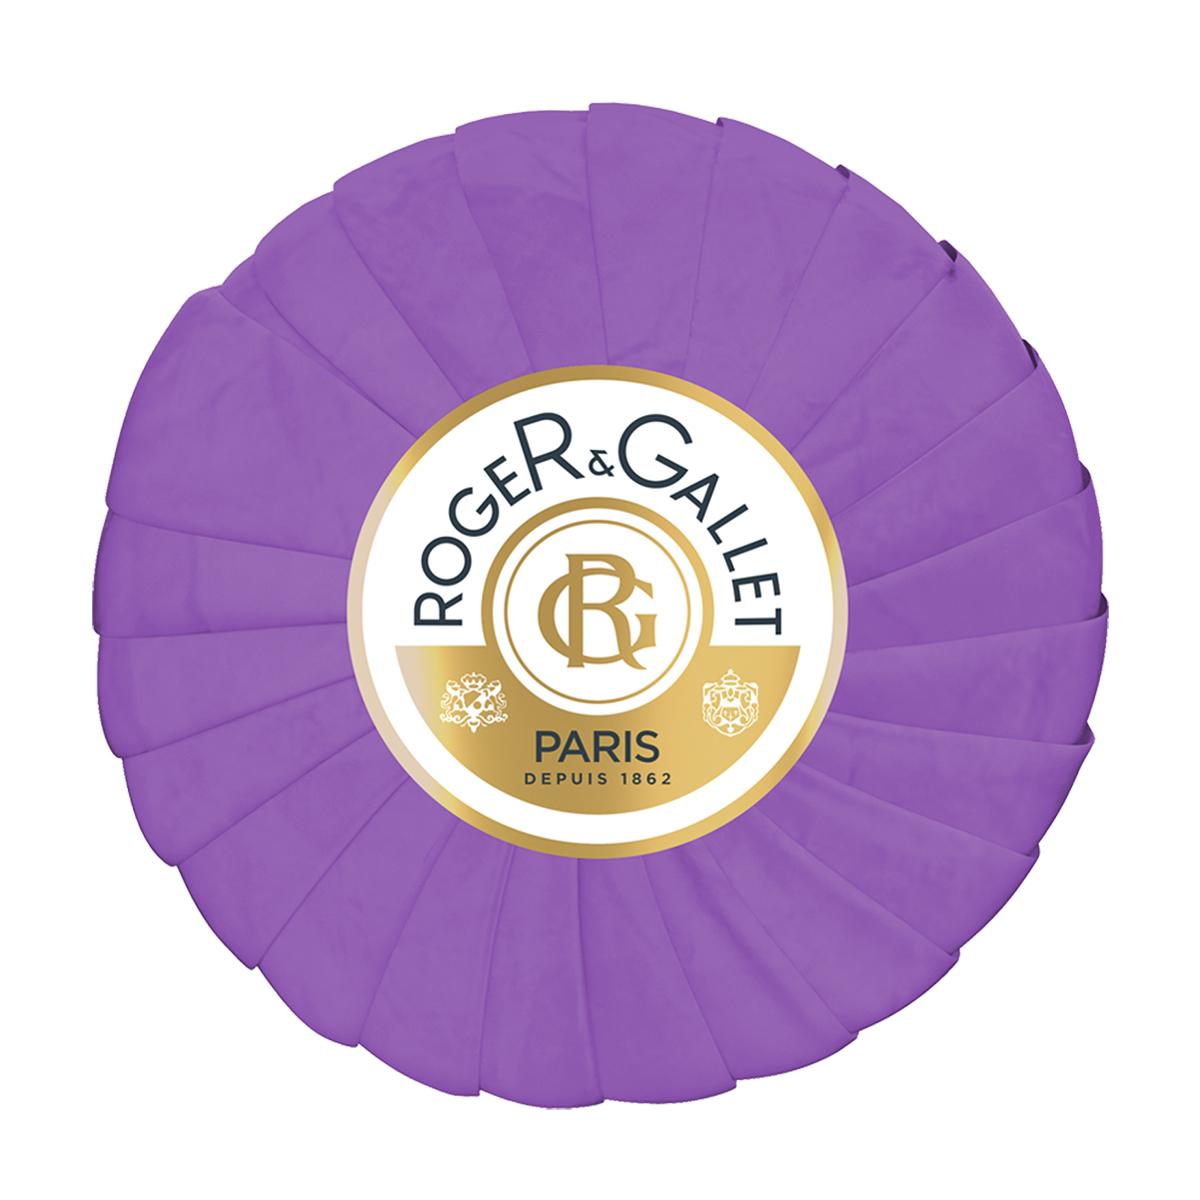 Roger&Gallet - Gingembre - Savon Parfumé 100 g